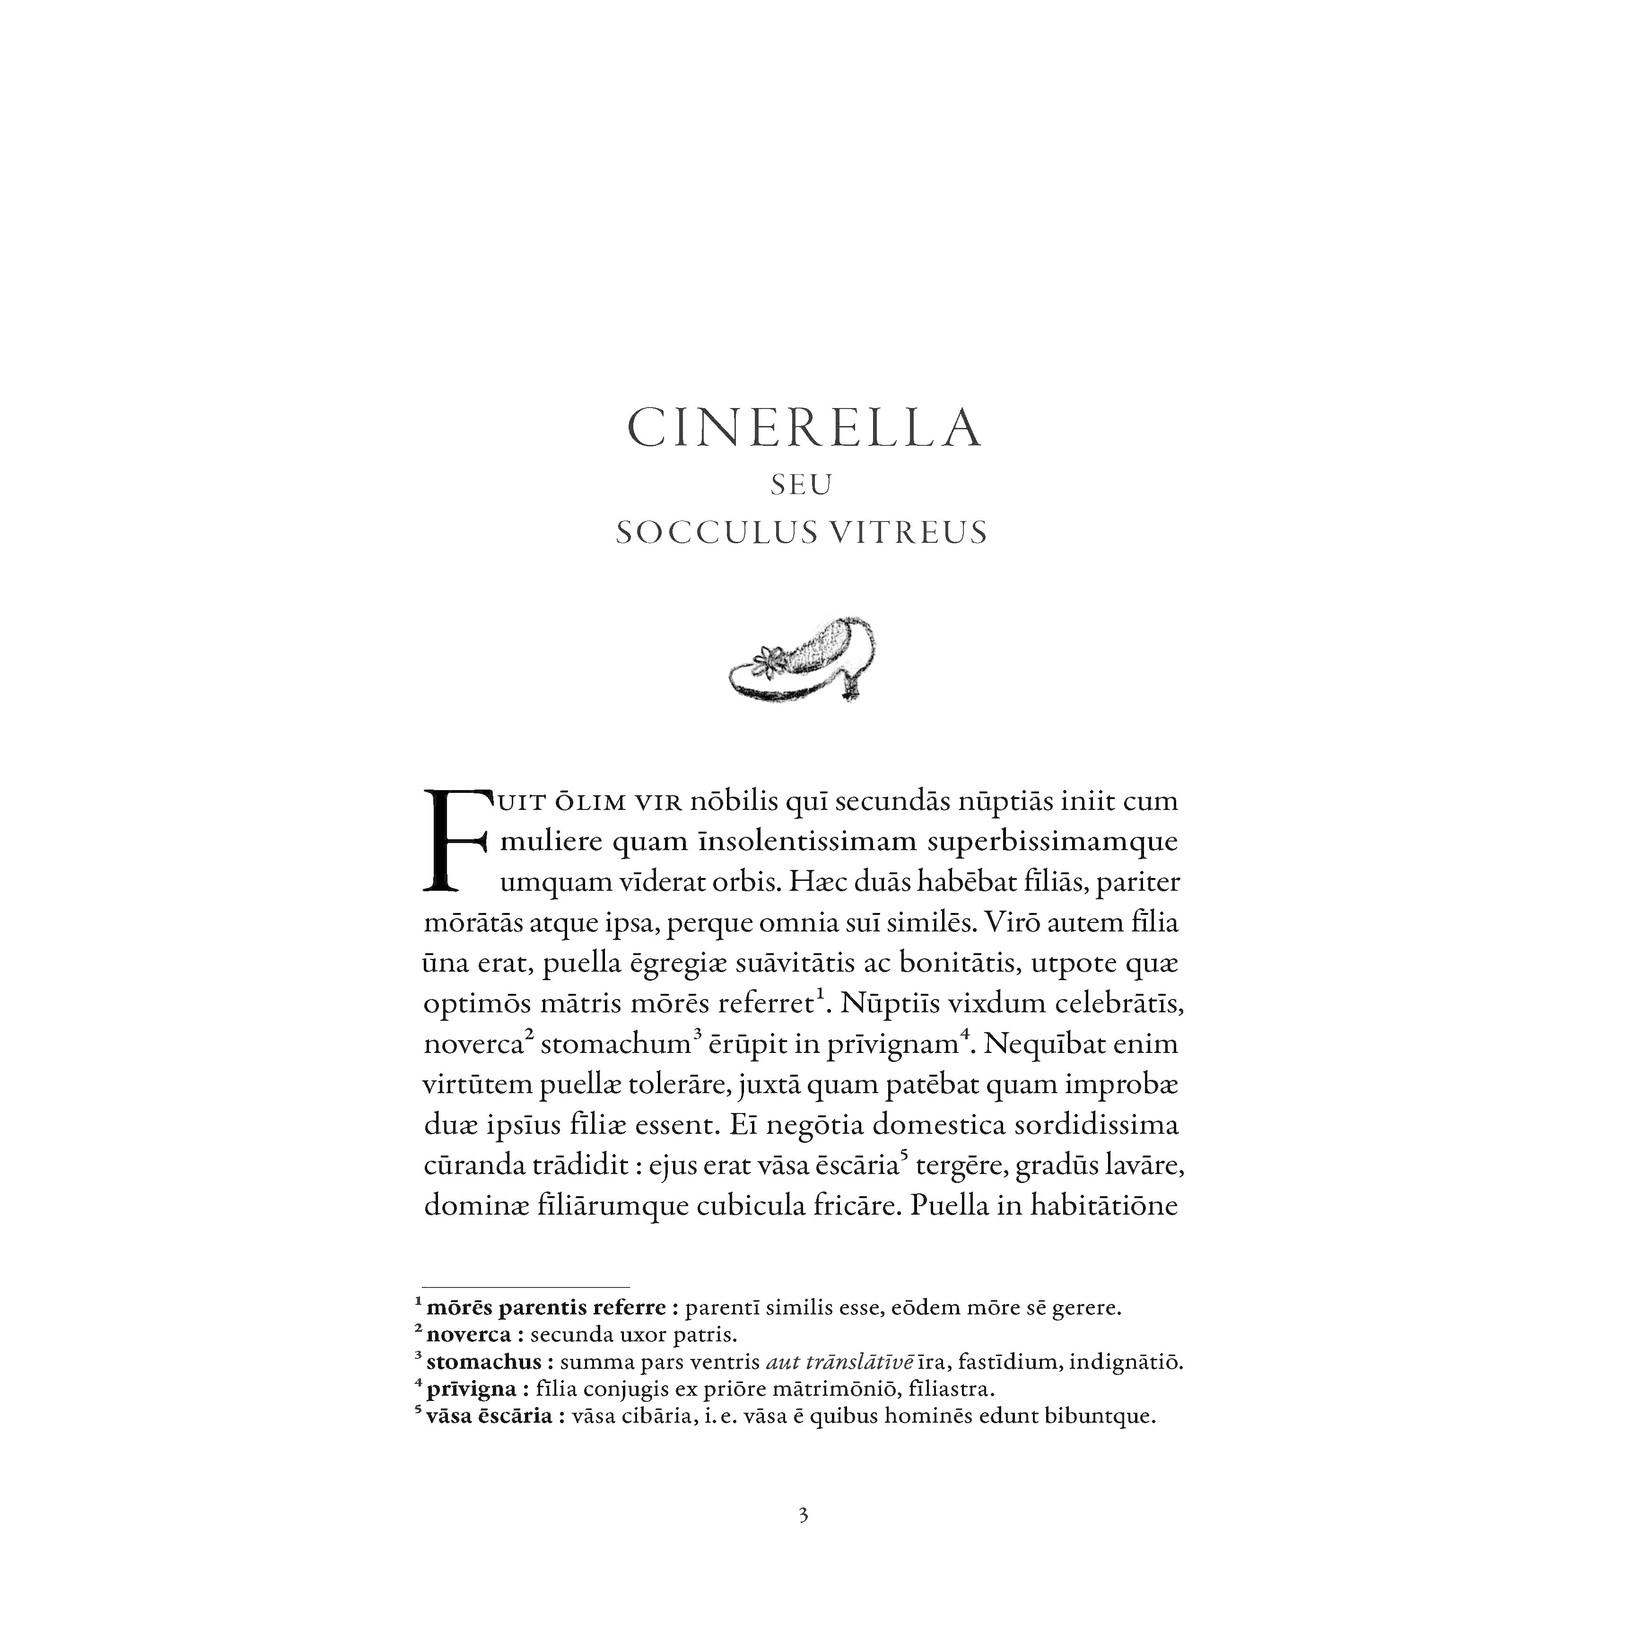 Latinitium Fabulae Gallicae - A Carolo Peralto Scriptae